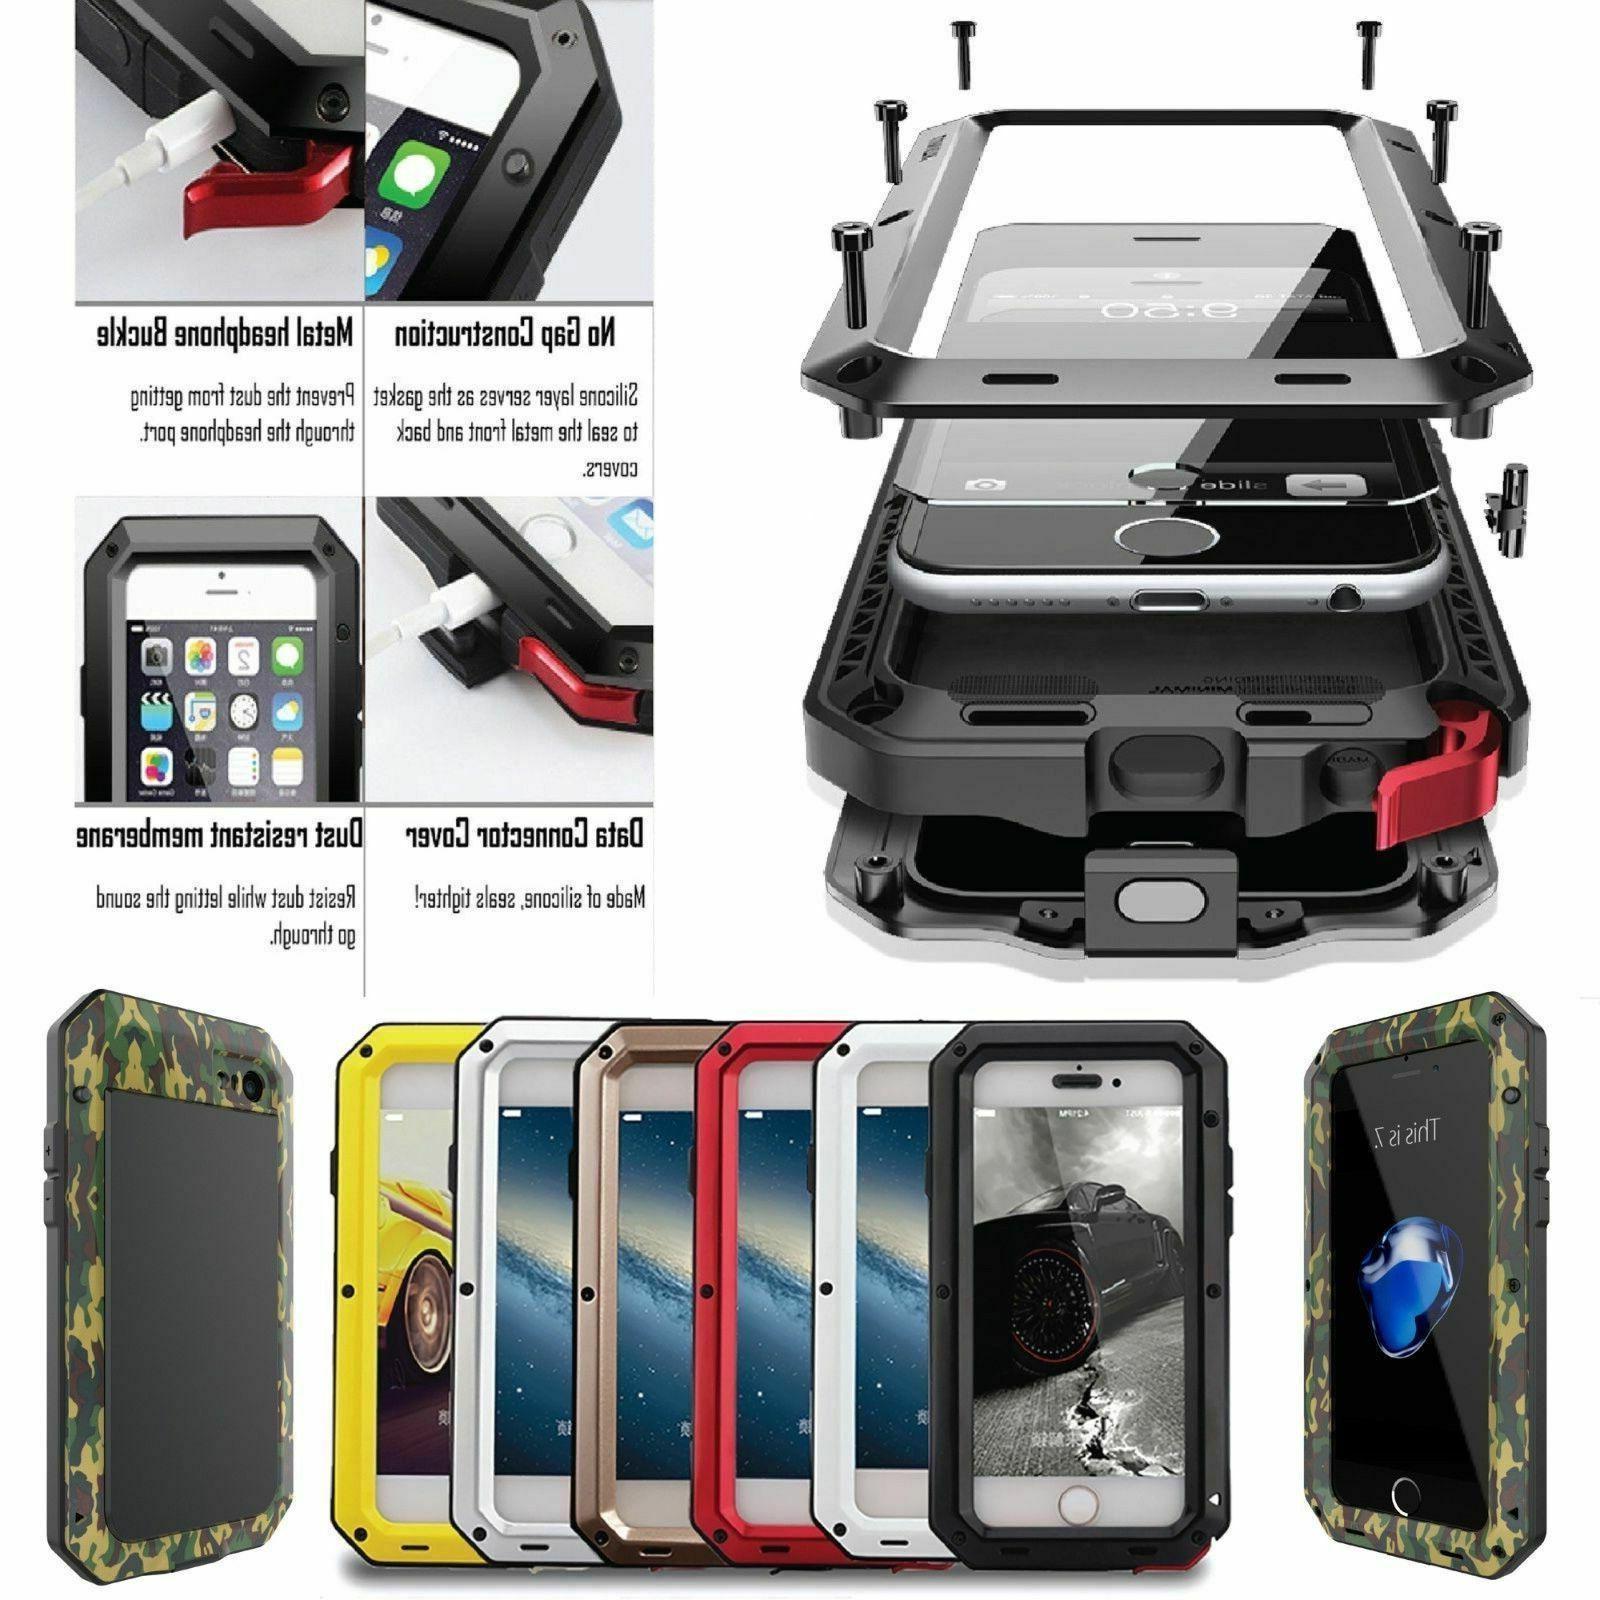 U.S Aluminum Defender Shock Waterproof Metal Case Cover For